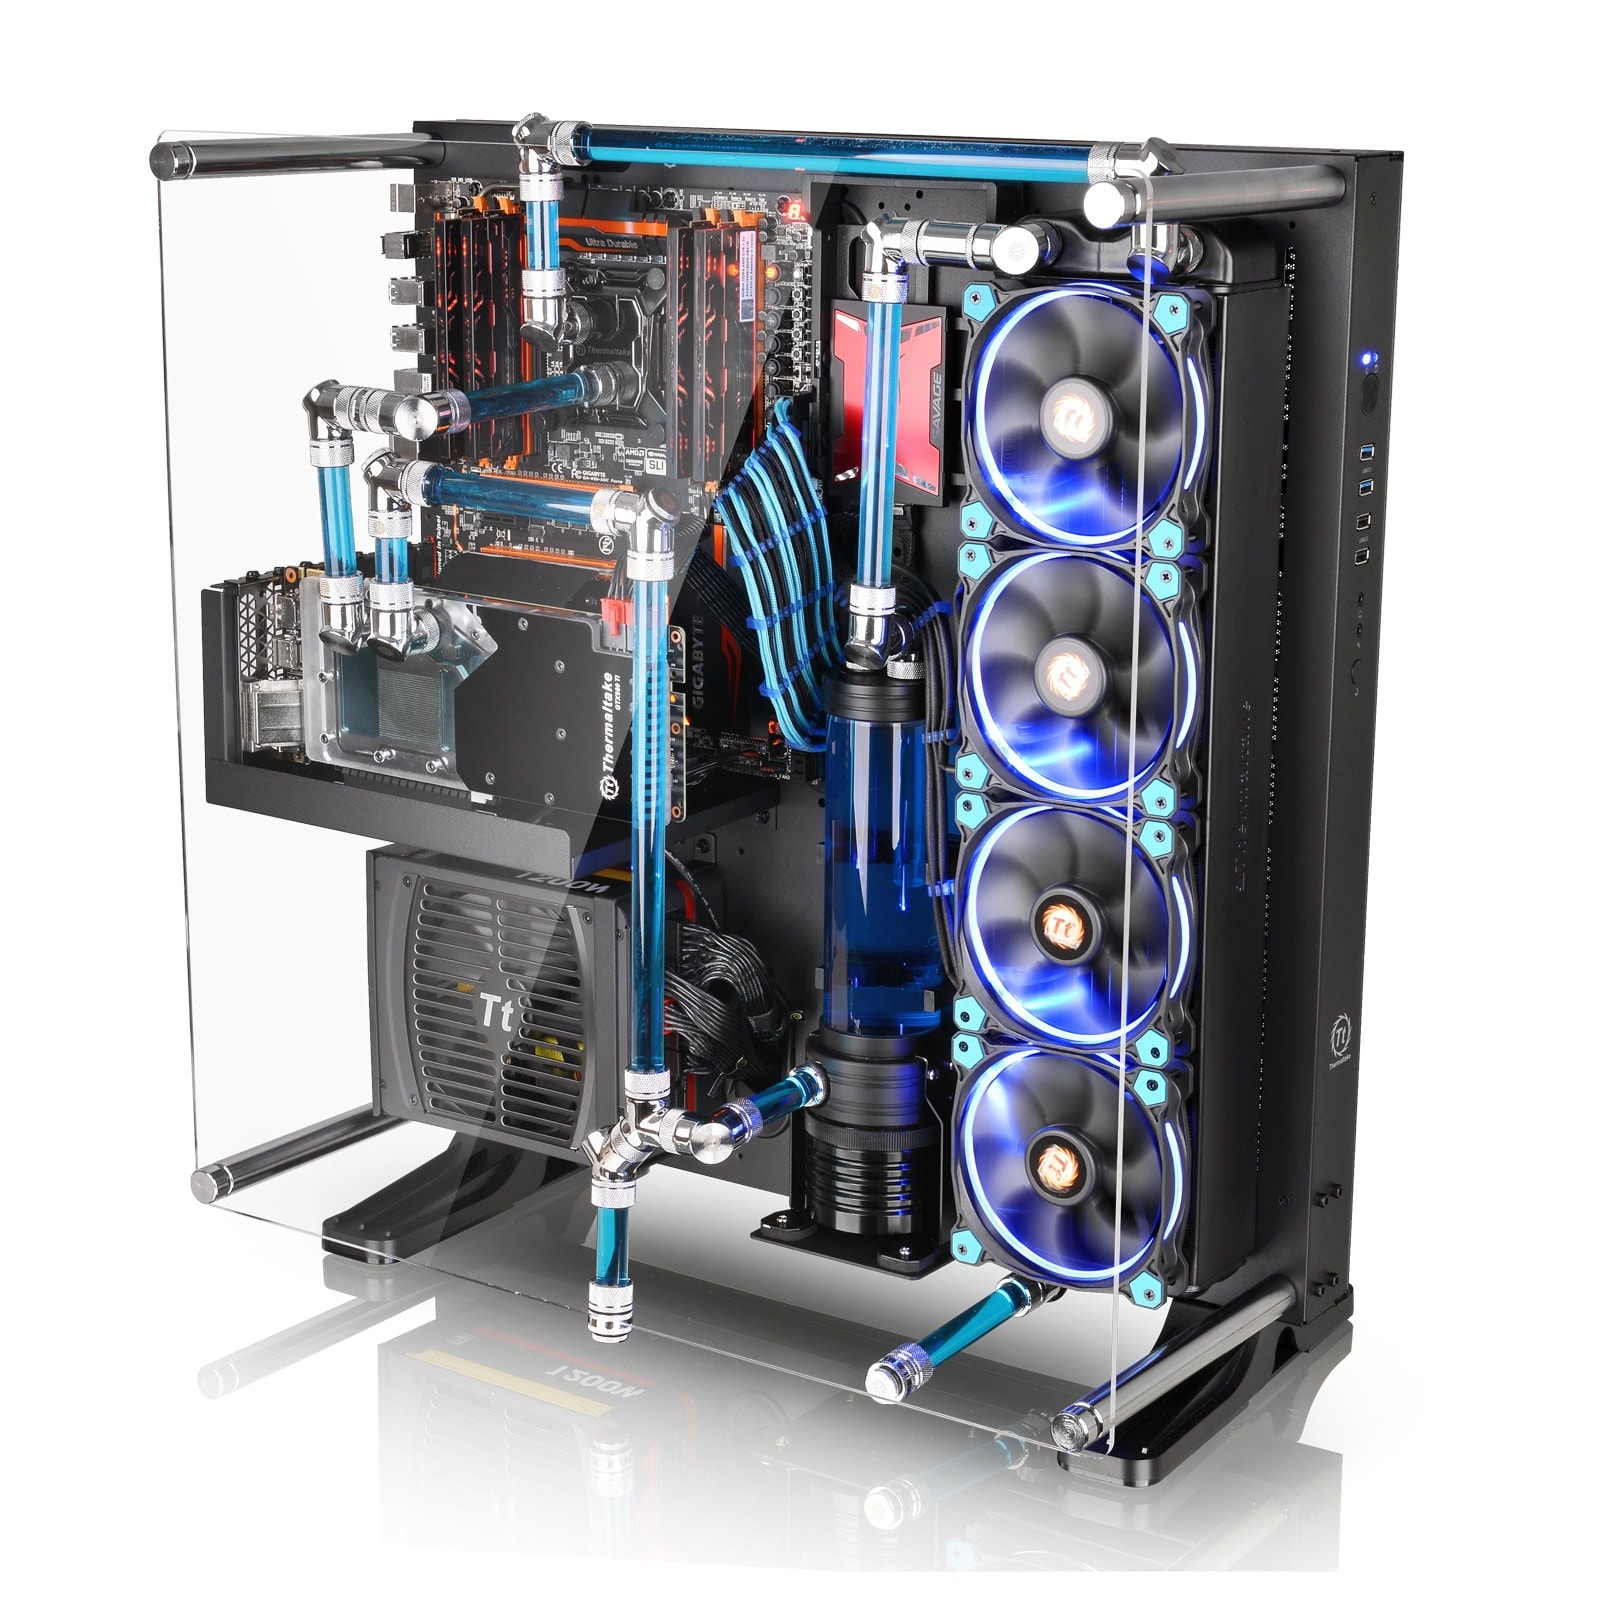 Thermaltake Core P5 (CA-1E7-00M1WN-00) - Achat / Vente Boîtier PC sur Cybertek.fr - 4